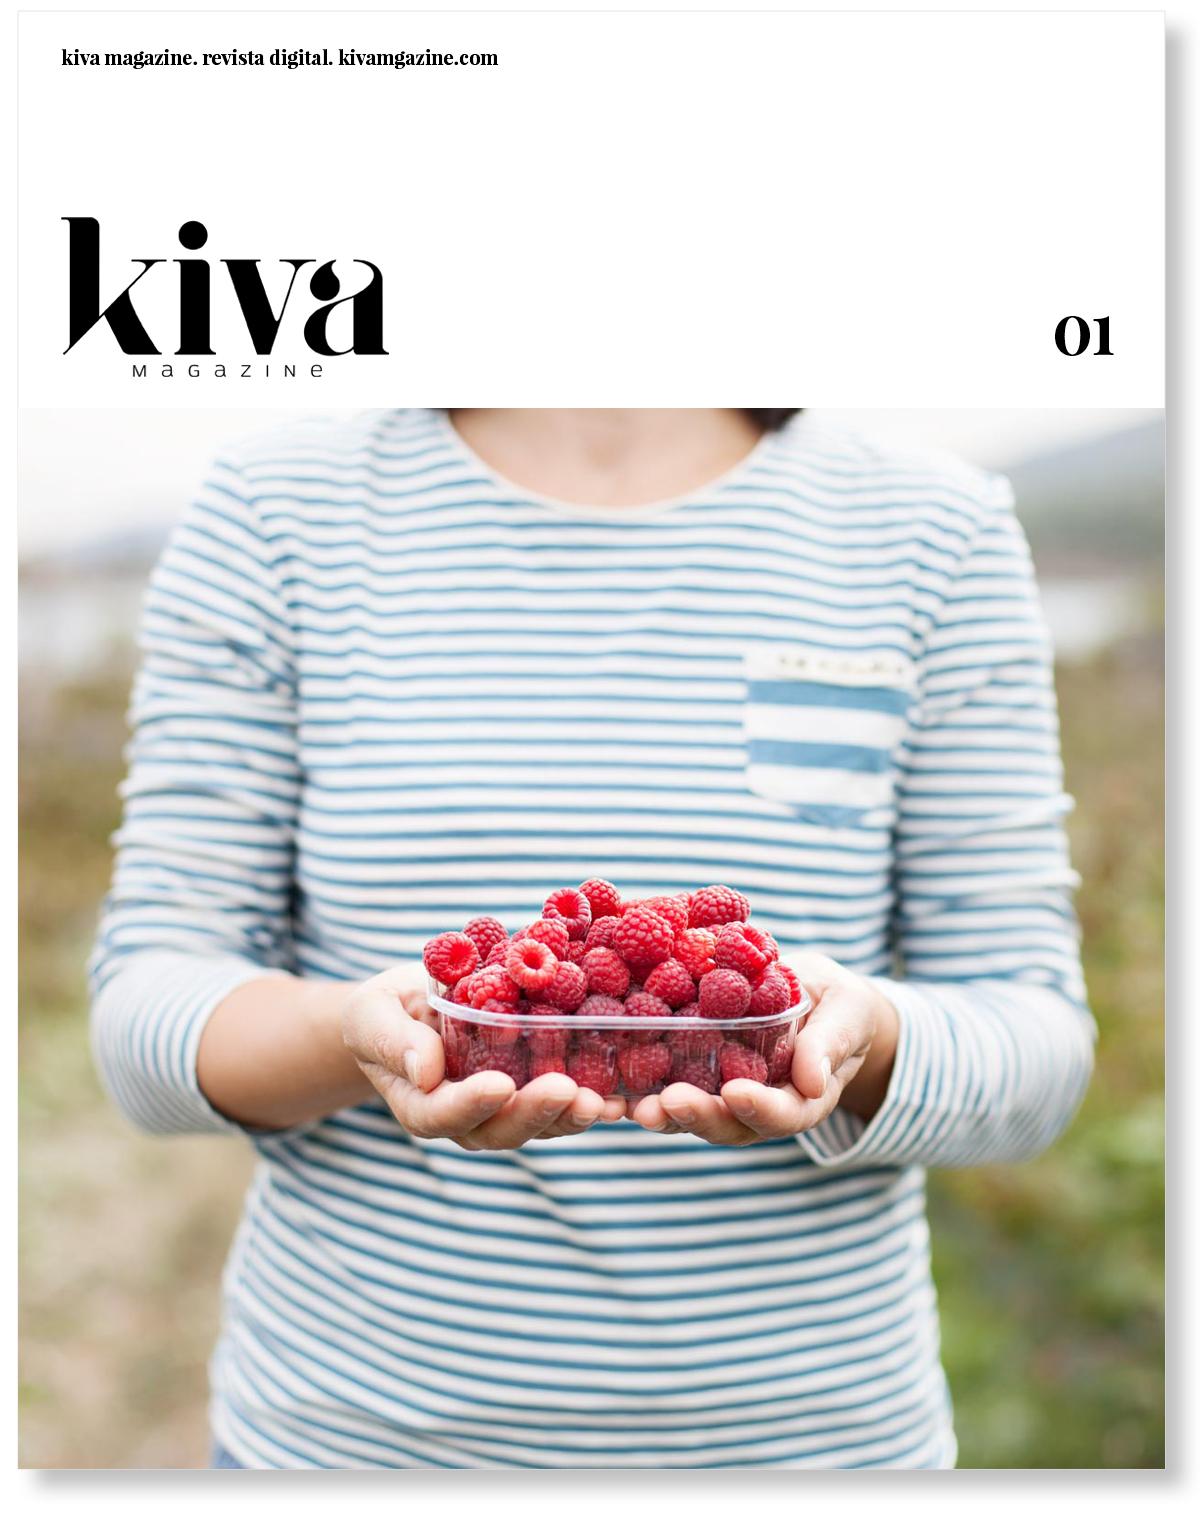 Primer número Kiva magazine, portada